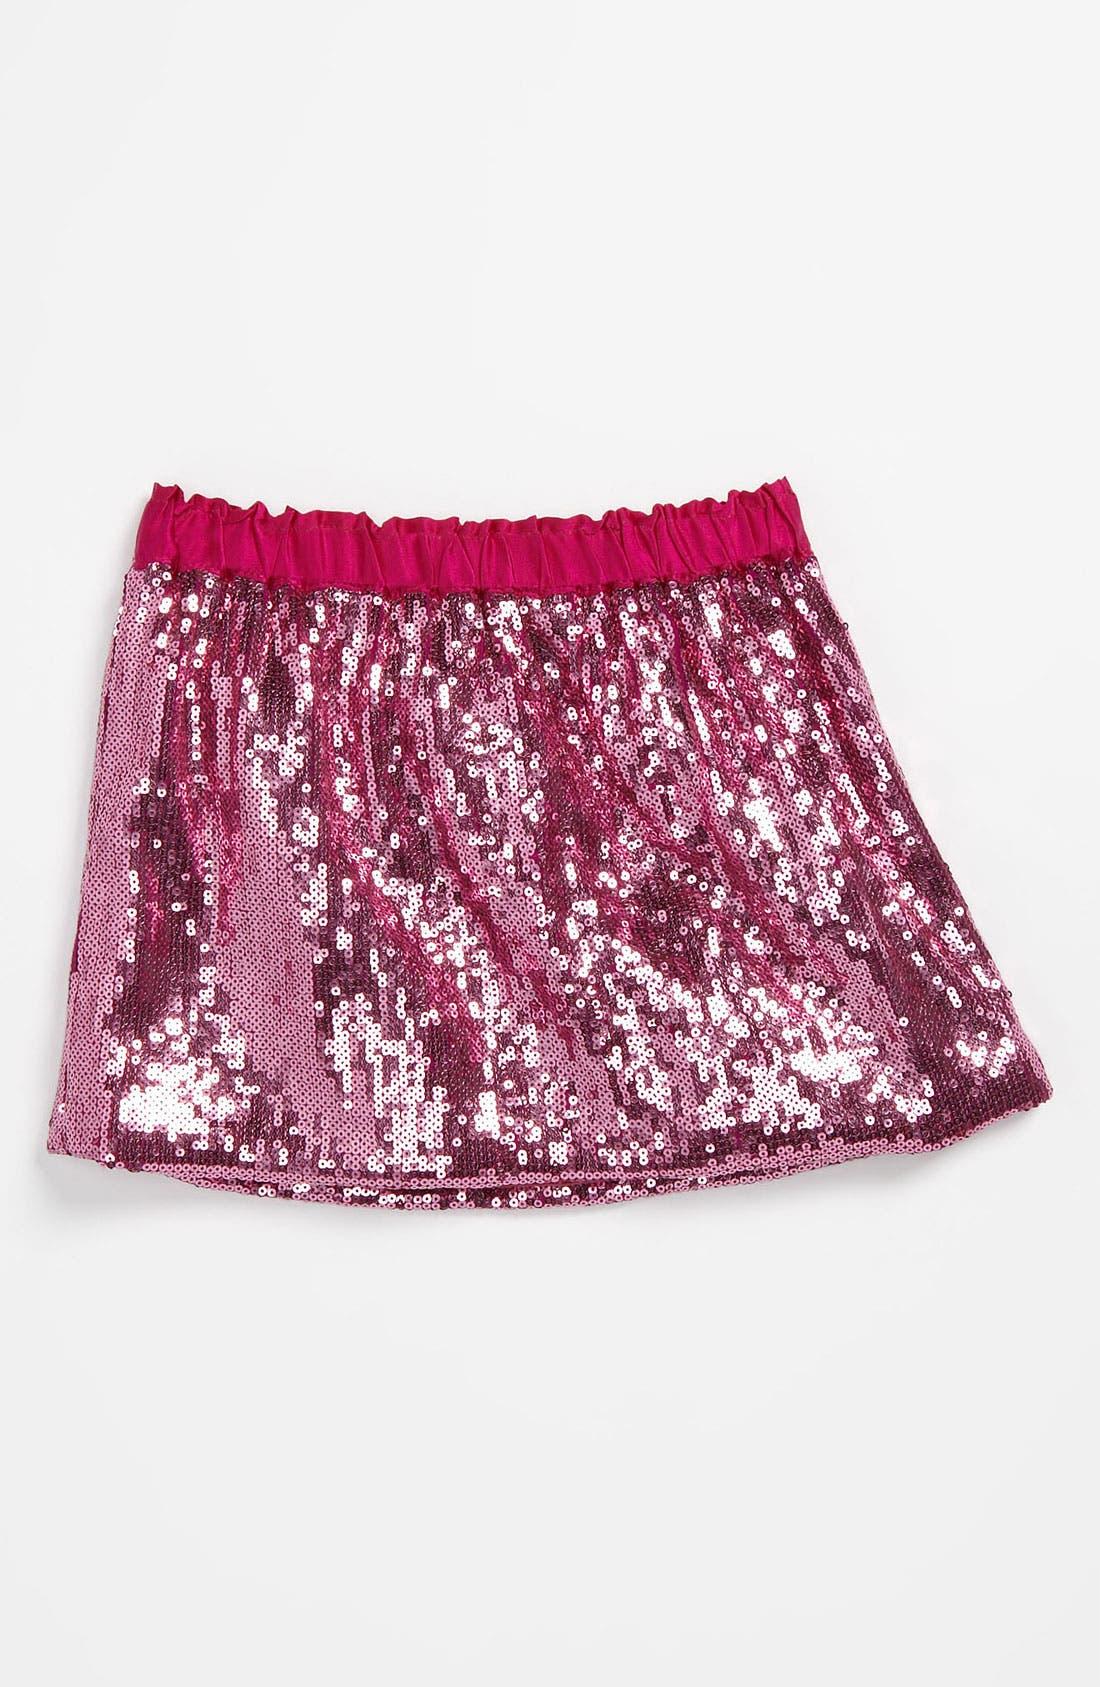 Main Image - Curio+Kind Sparkle Skirt (Toddler)